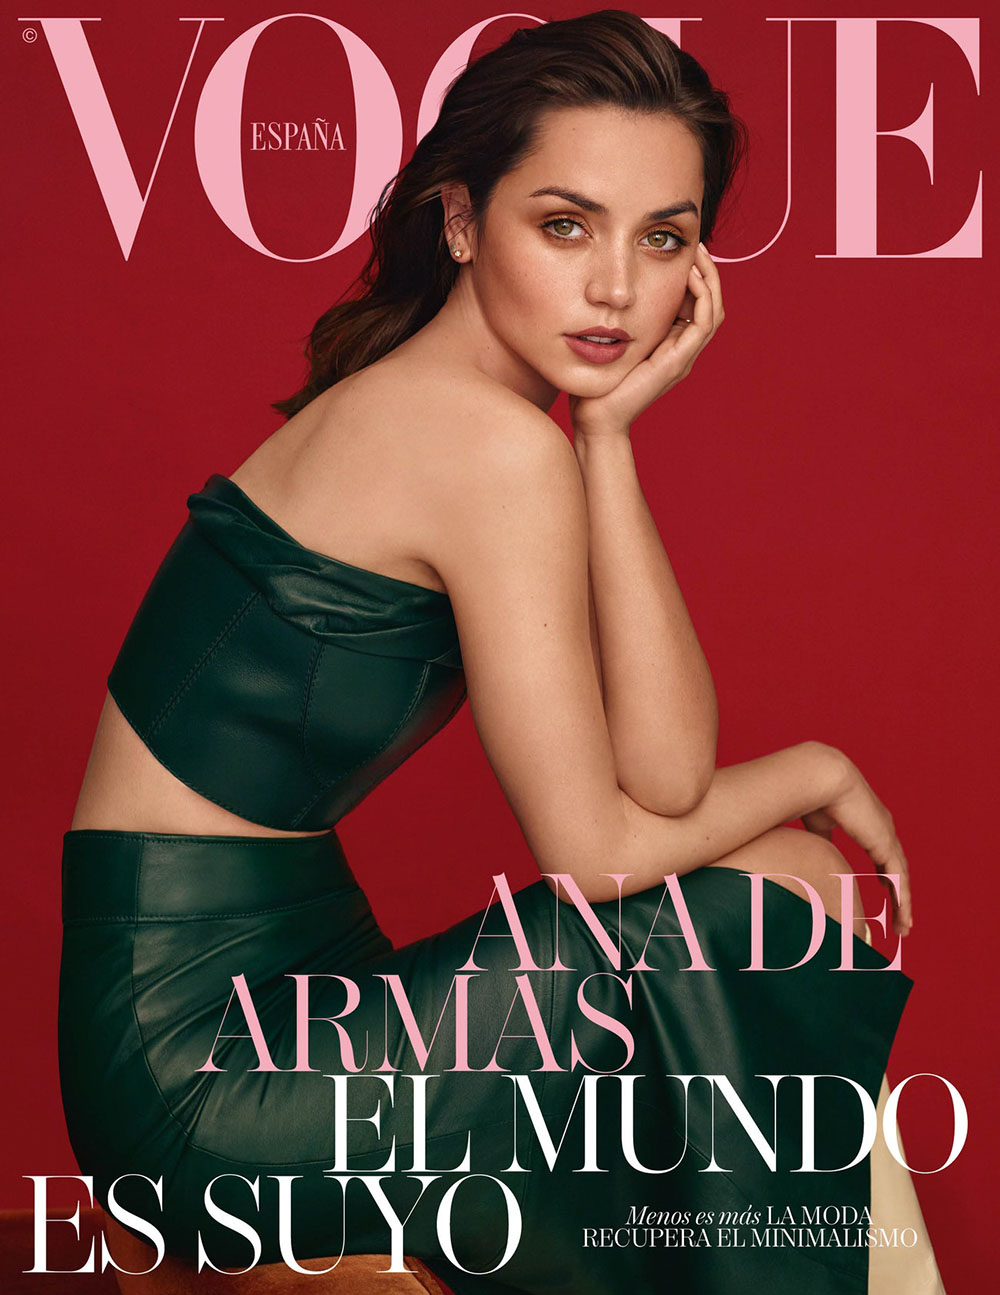 Ana de Armas covers Vogue Spain April 2020 by Thomas Whiteside